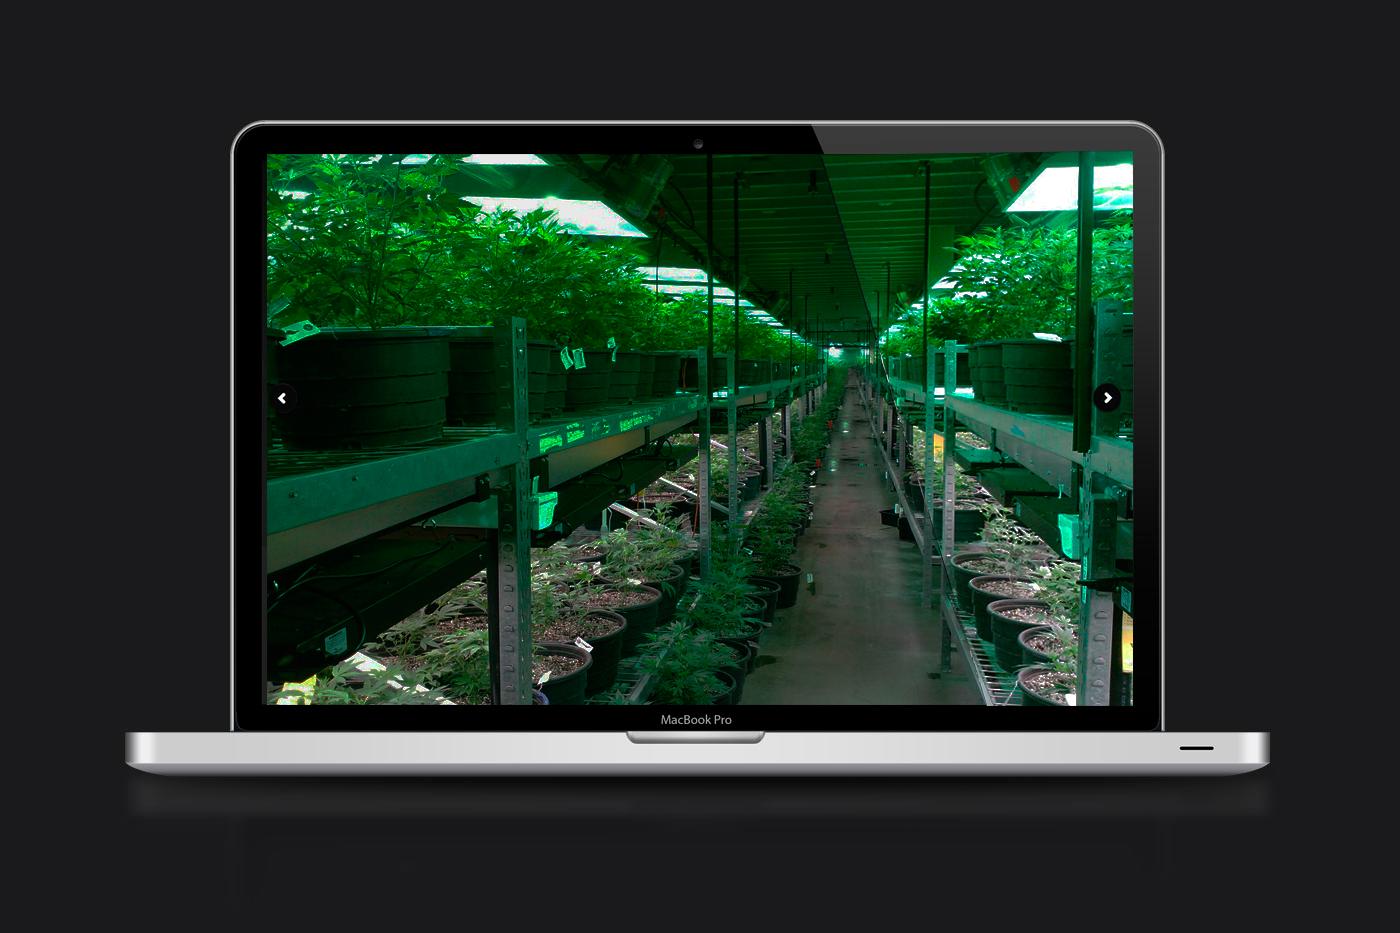 iluminar planta marihuana